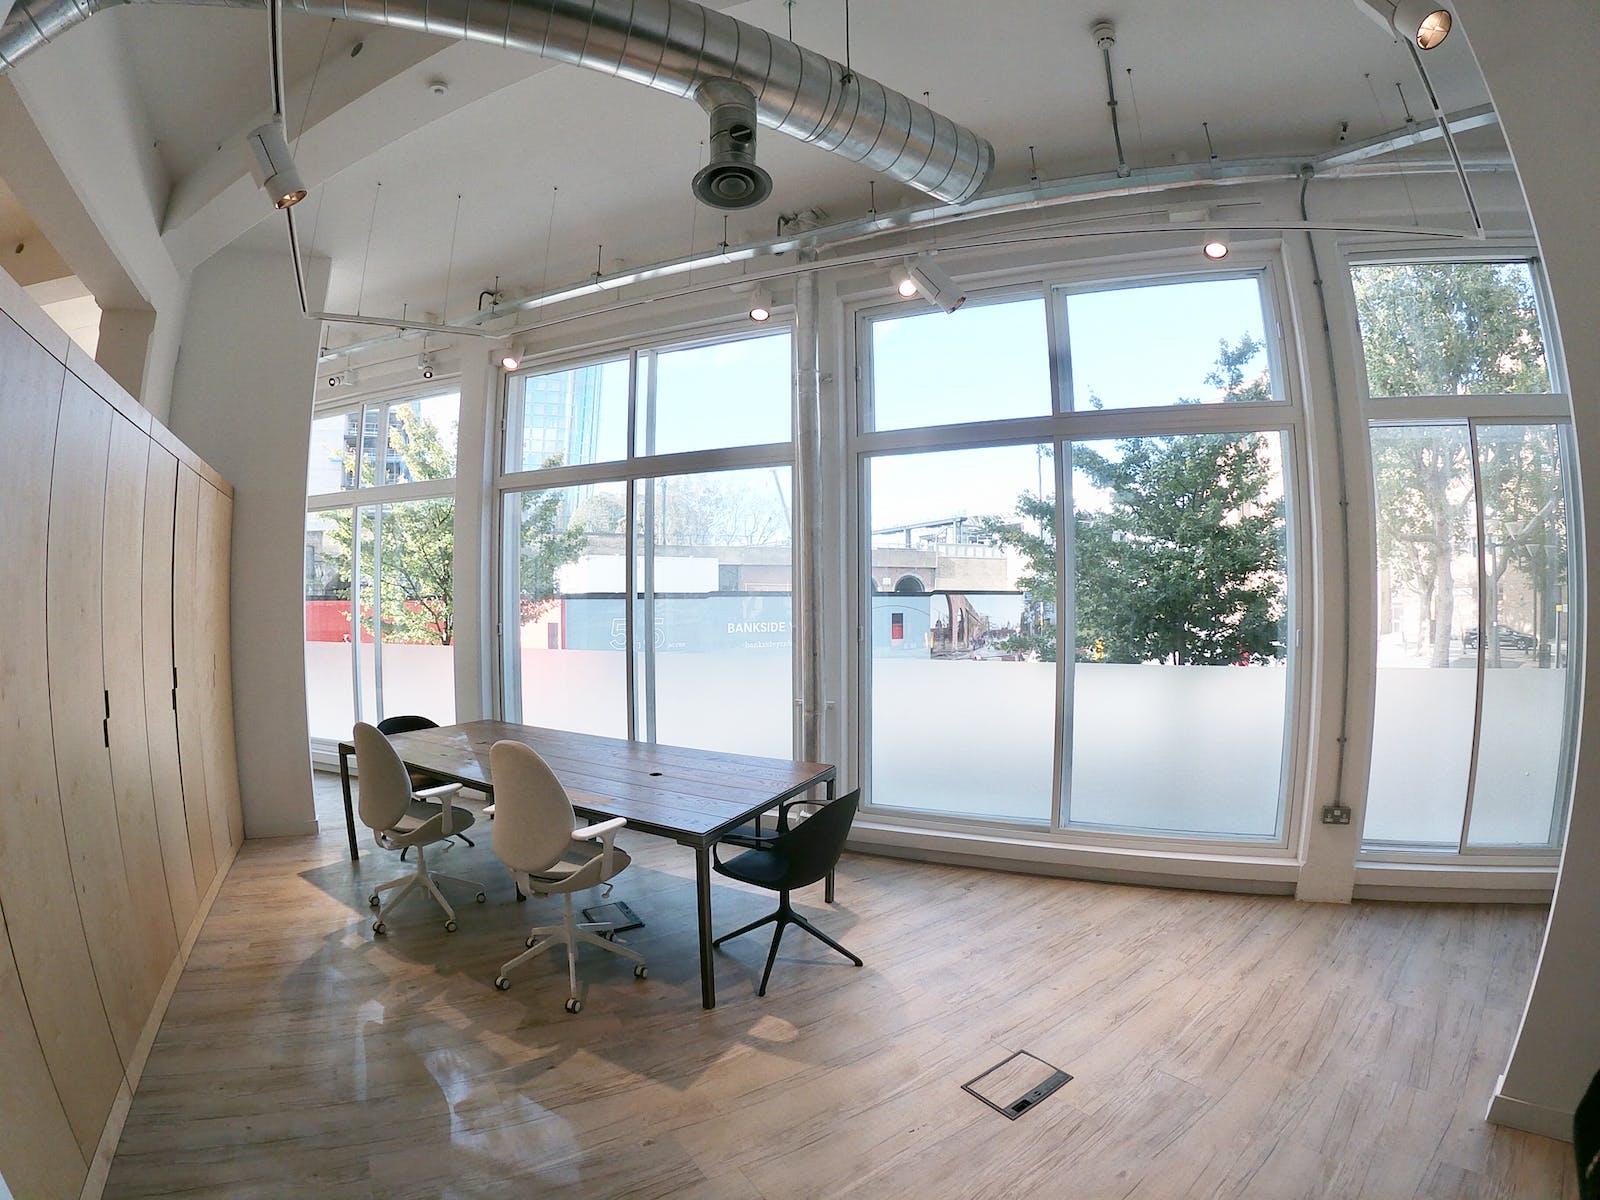 65C Hopton Street, London, Office To Let - Internal (4)